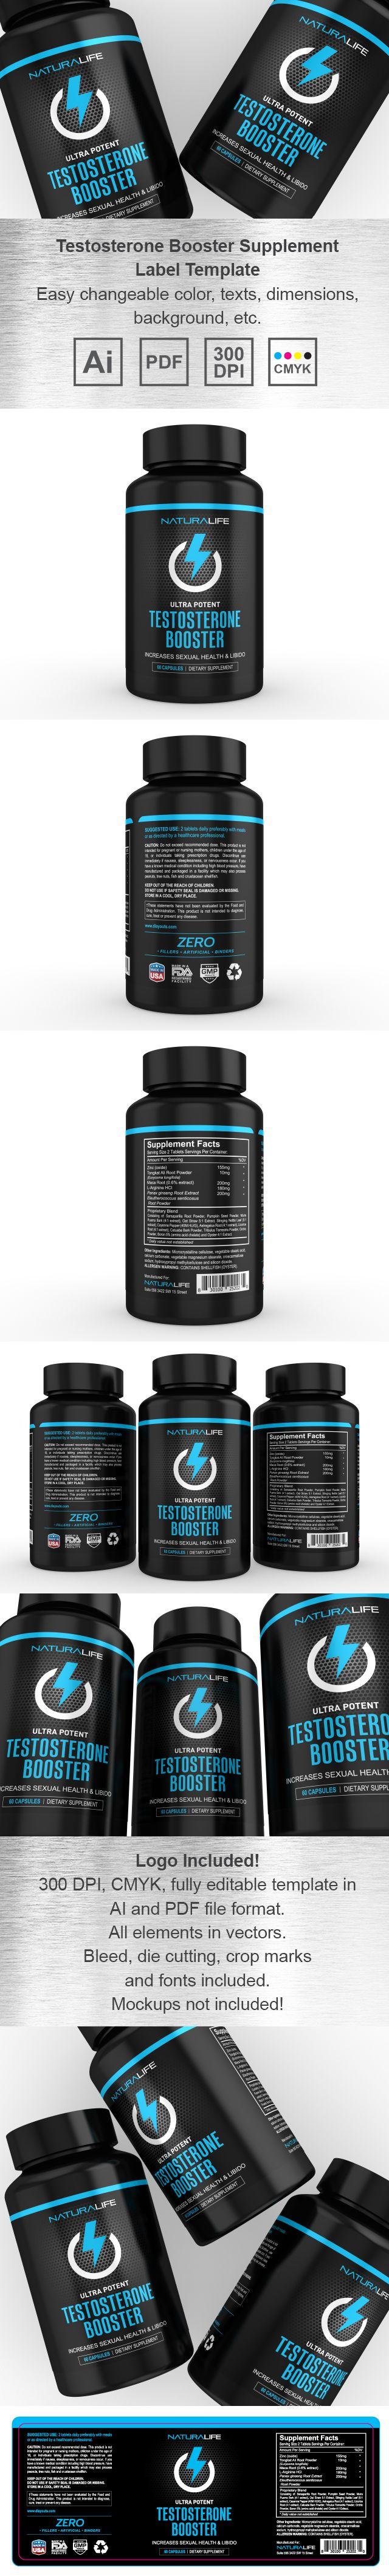 Testosterone Booster Supplement Label Template HttpWwwDlayouts